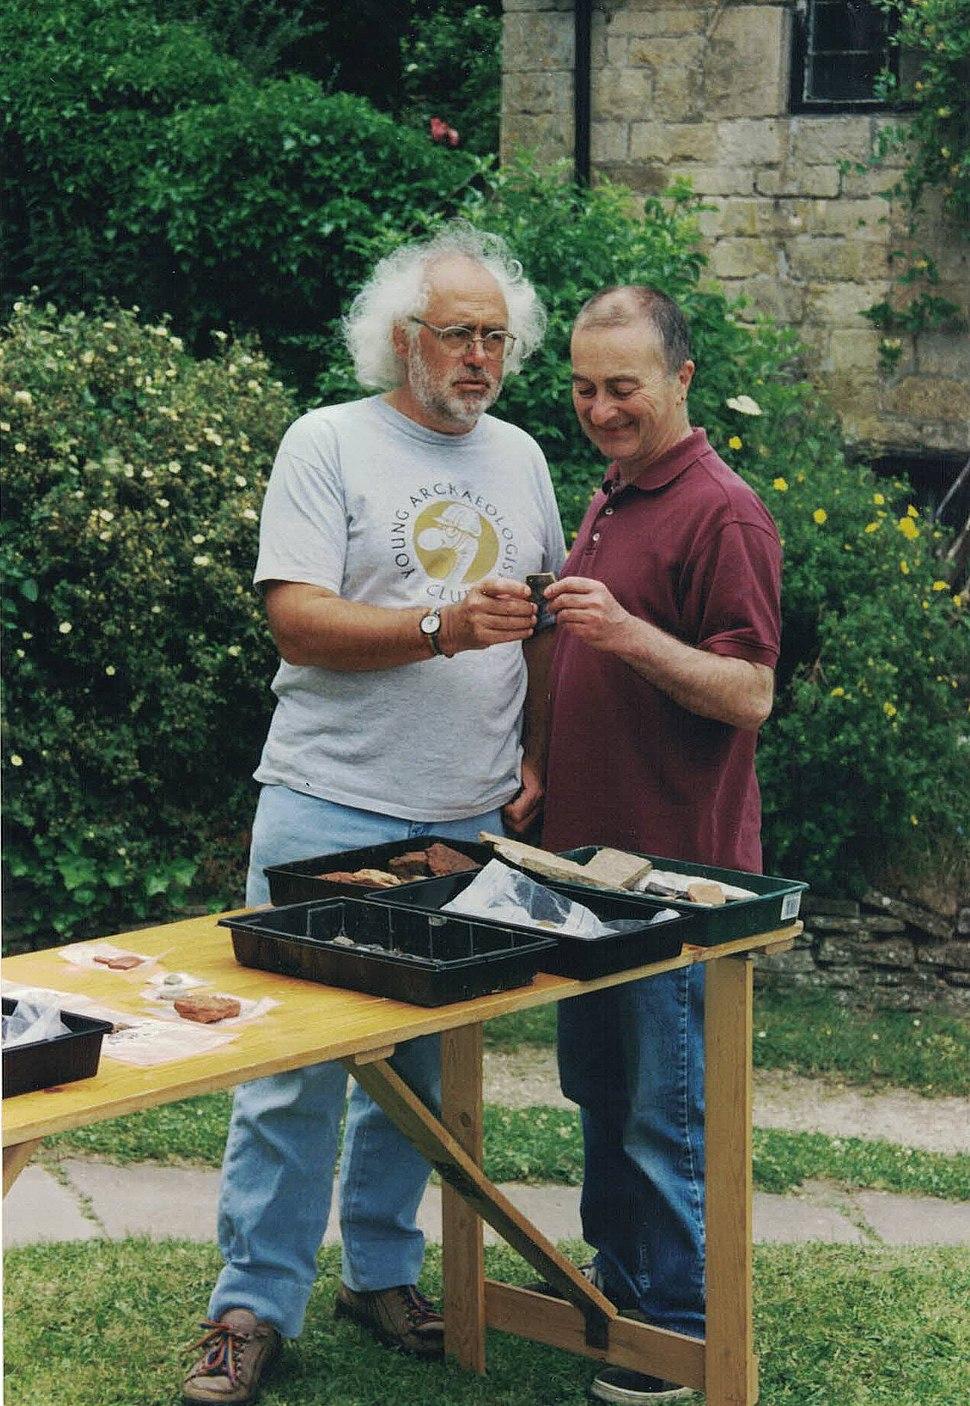 Mick Aston and Tony Robinson, Waltham Fields, 2000